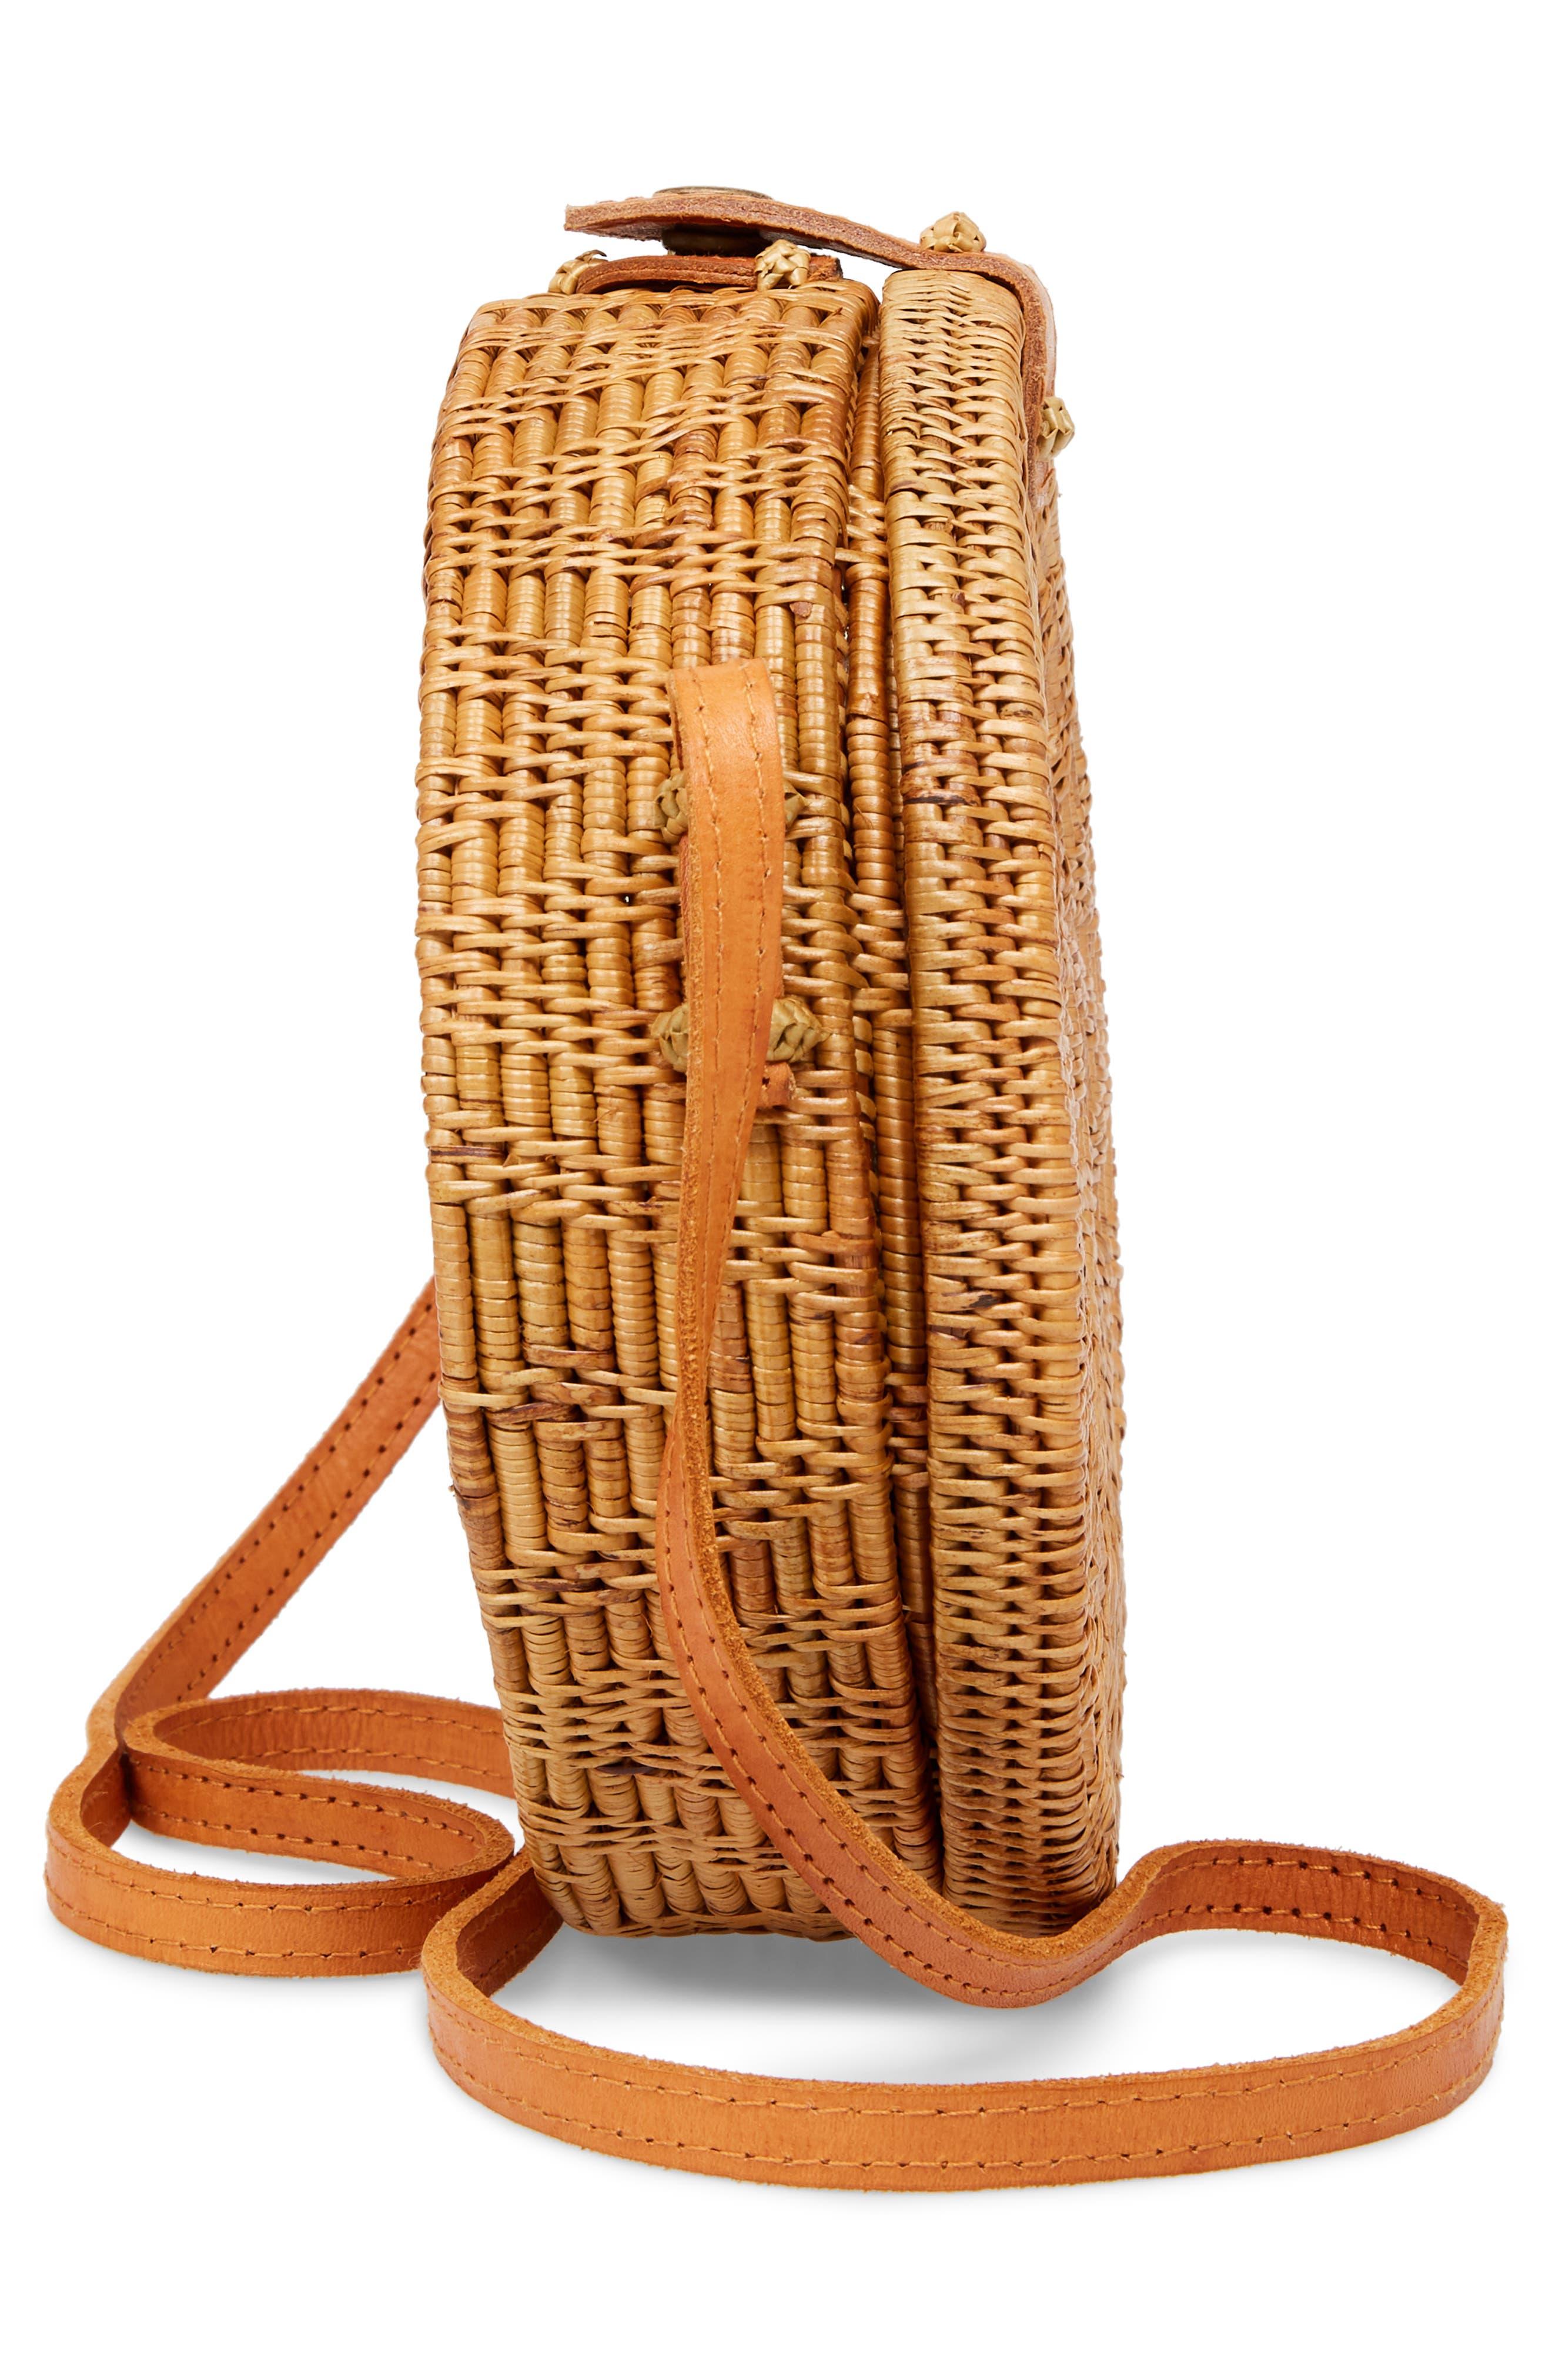 Woven Rattan Circle Basket Crossbody,                             Alternate thumbnail 5, color,                             200